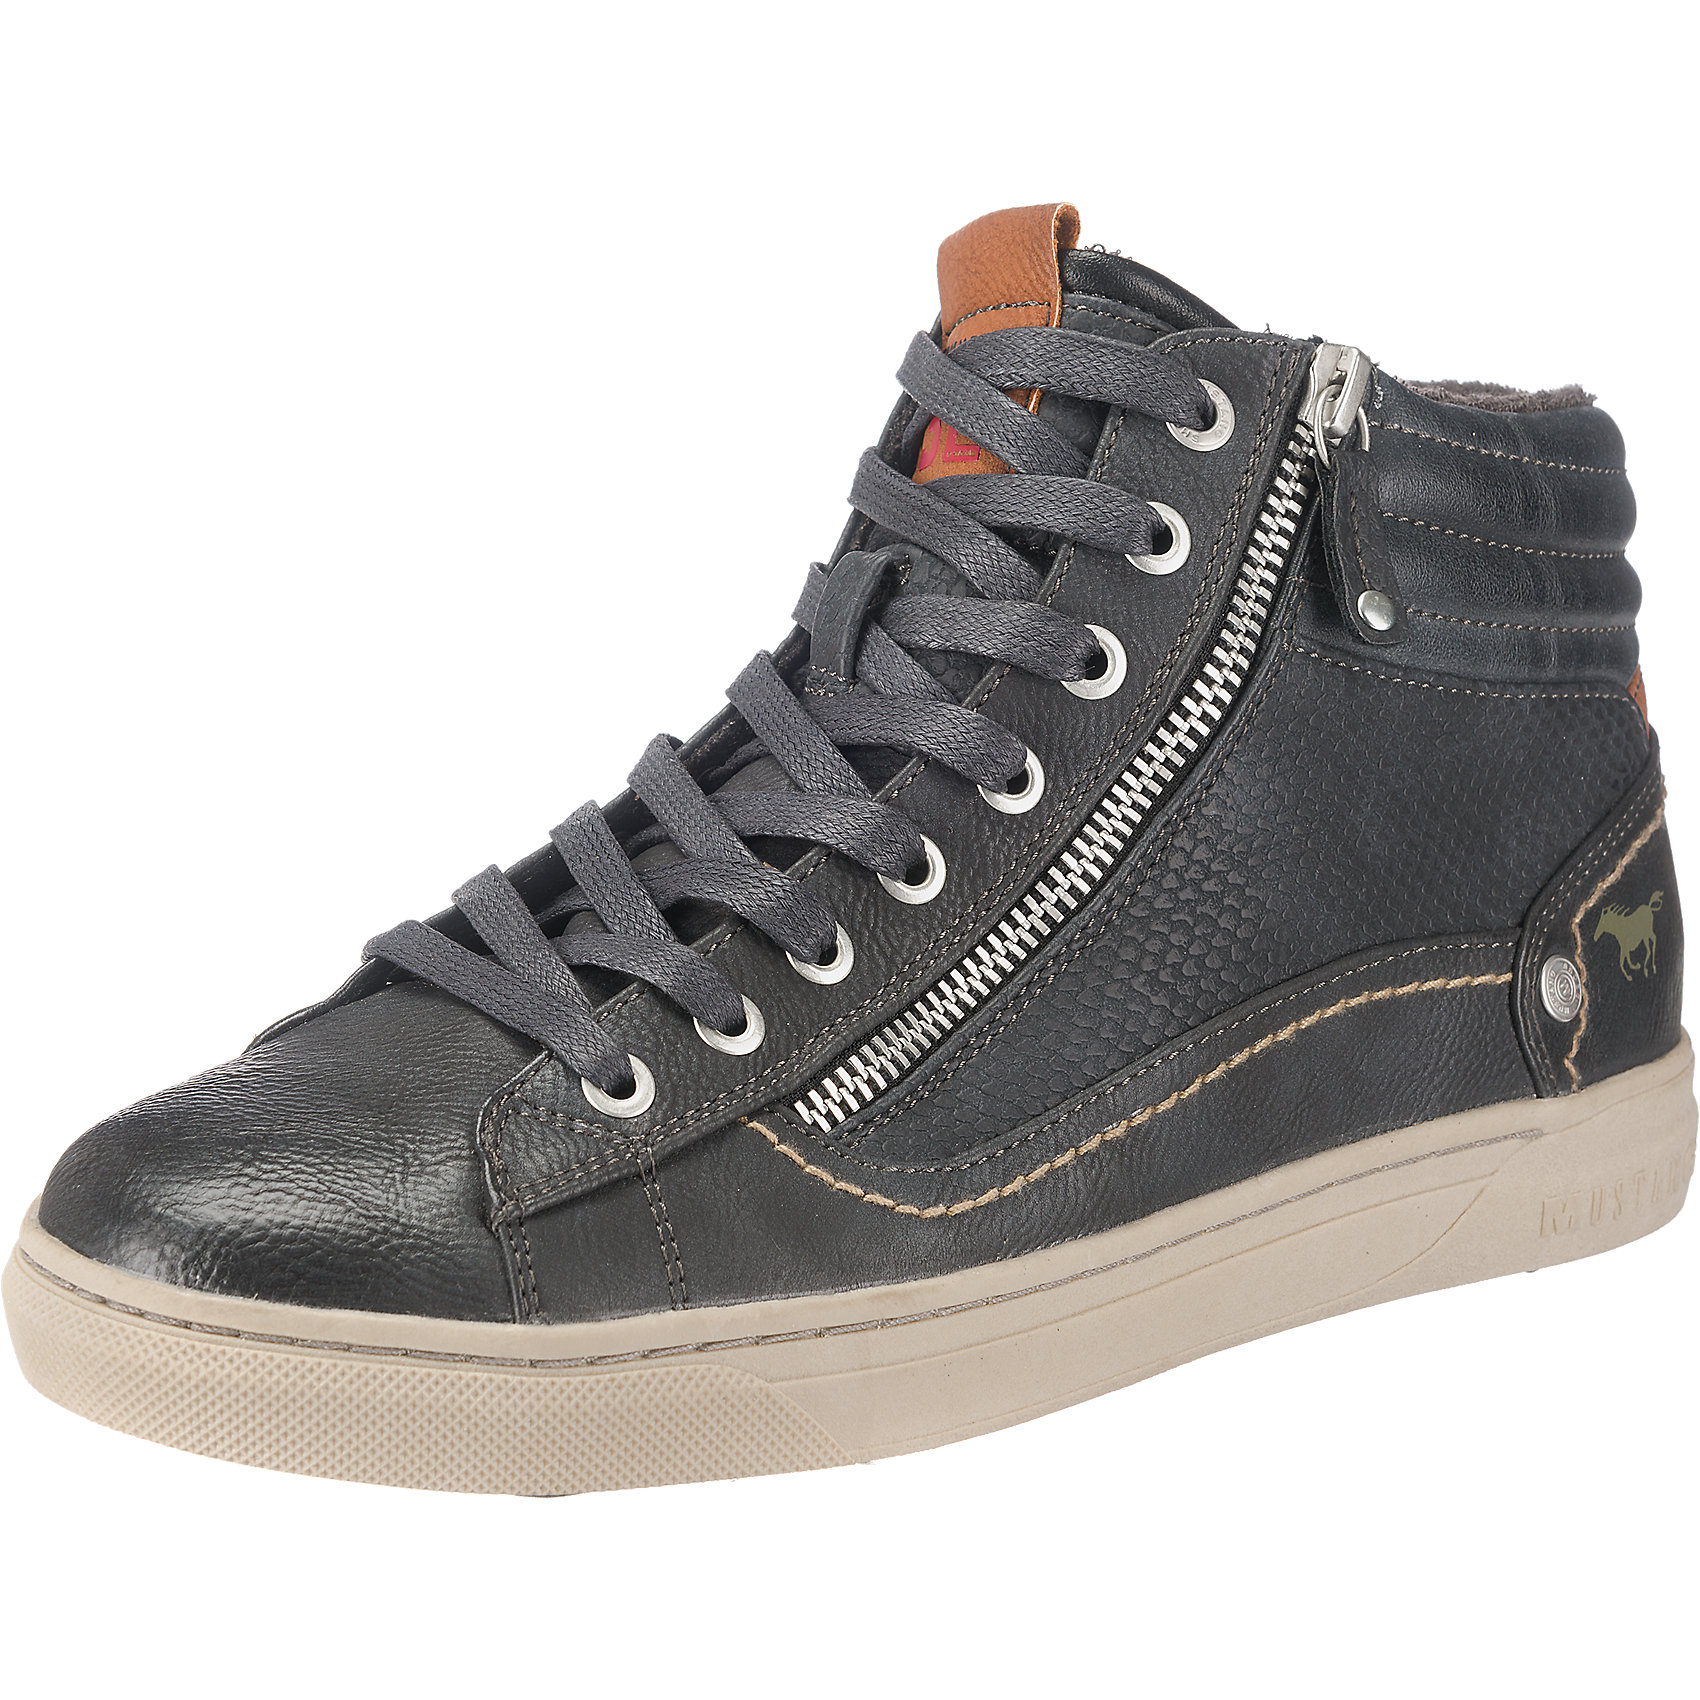 Billig Sneakers gute Qualität Neu MUSTANG Sneakers Billig schwarz 5763829 3ed357